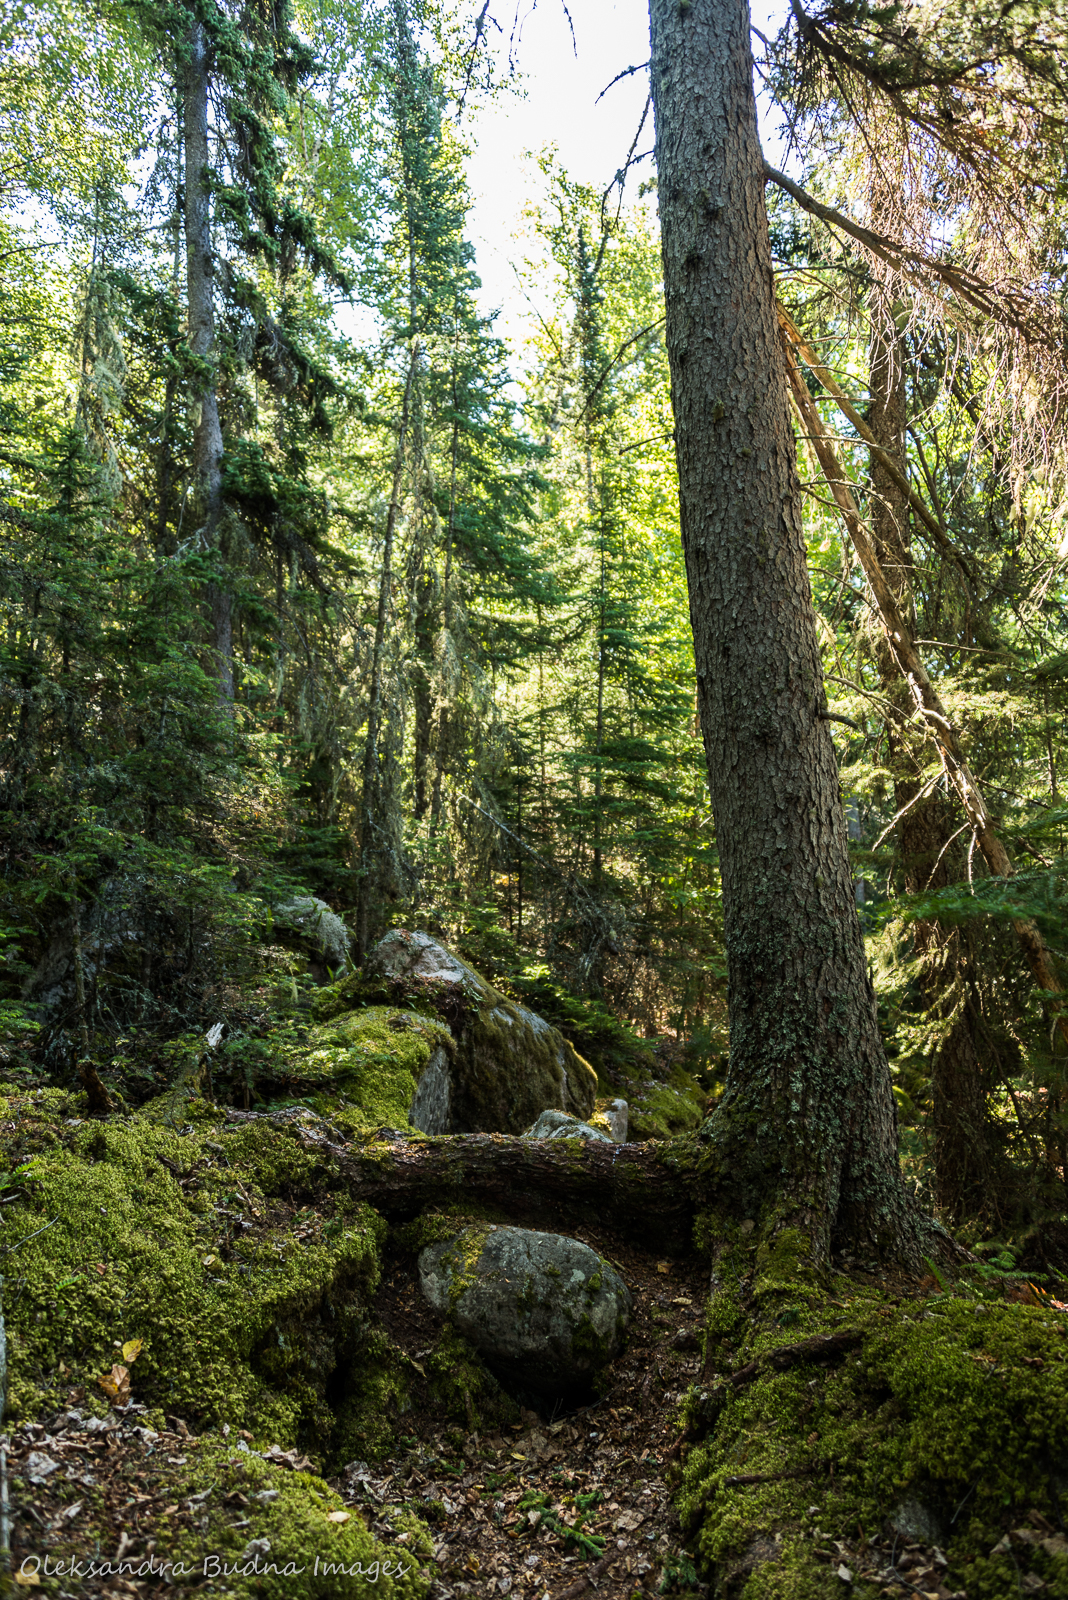 Coastal Hiking Trail in Pukaskwa